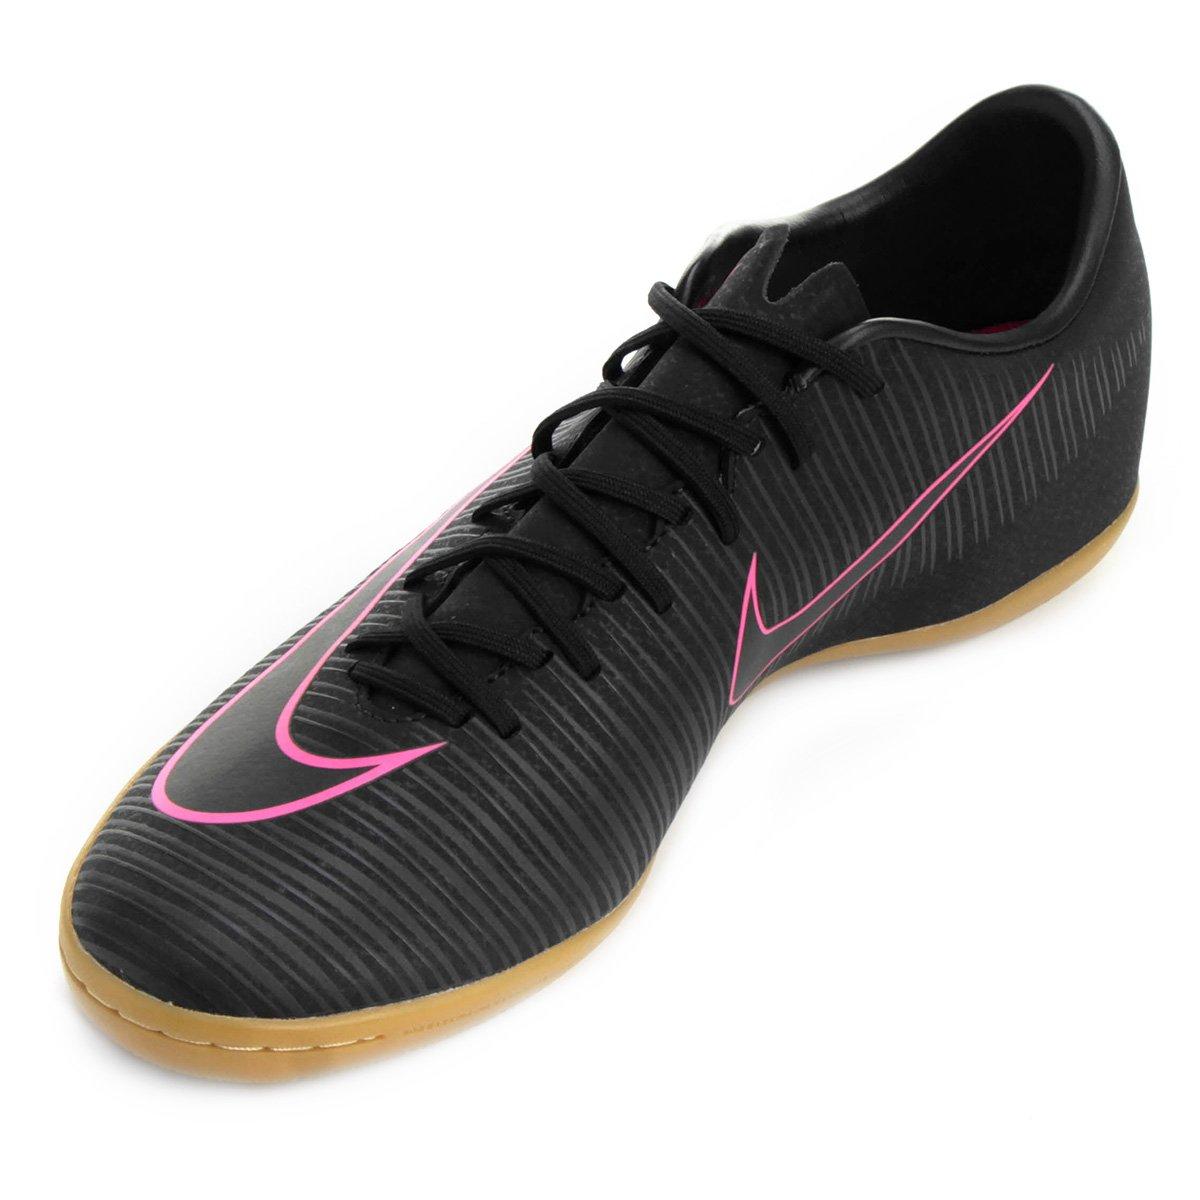 f5e17c1bf4 Chuteira Futsal Nike Mercurial Victory 6 IC - Compre Agora